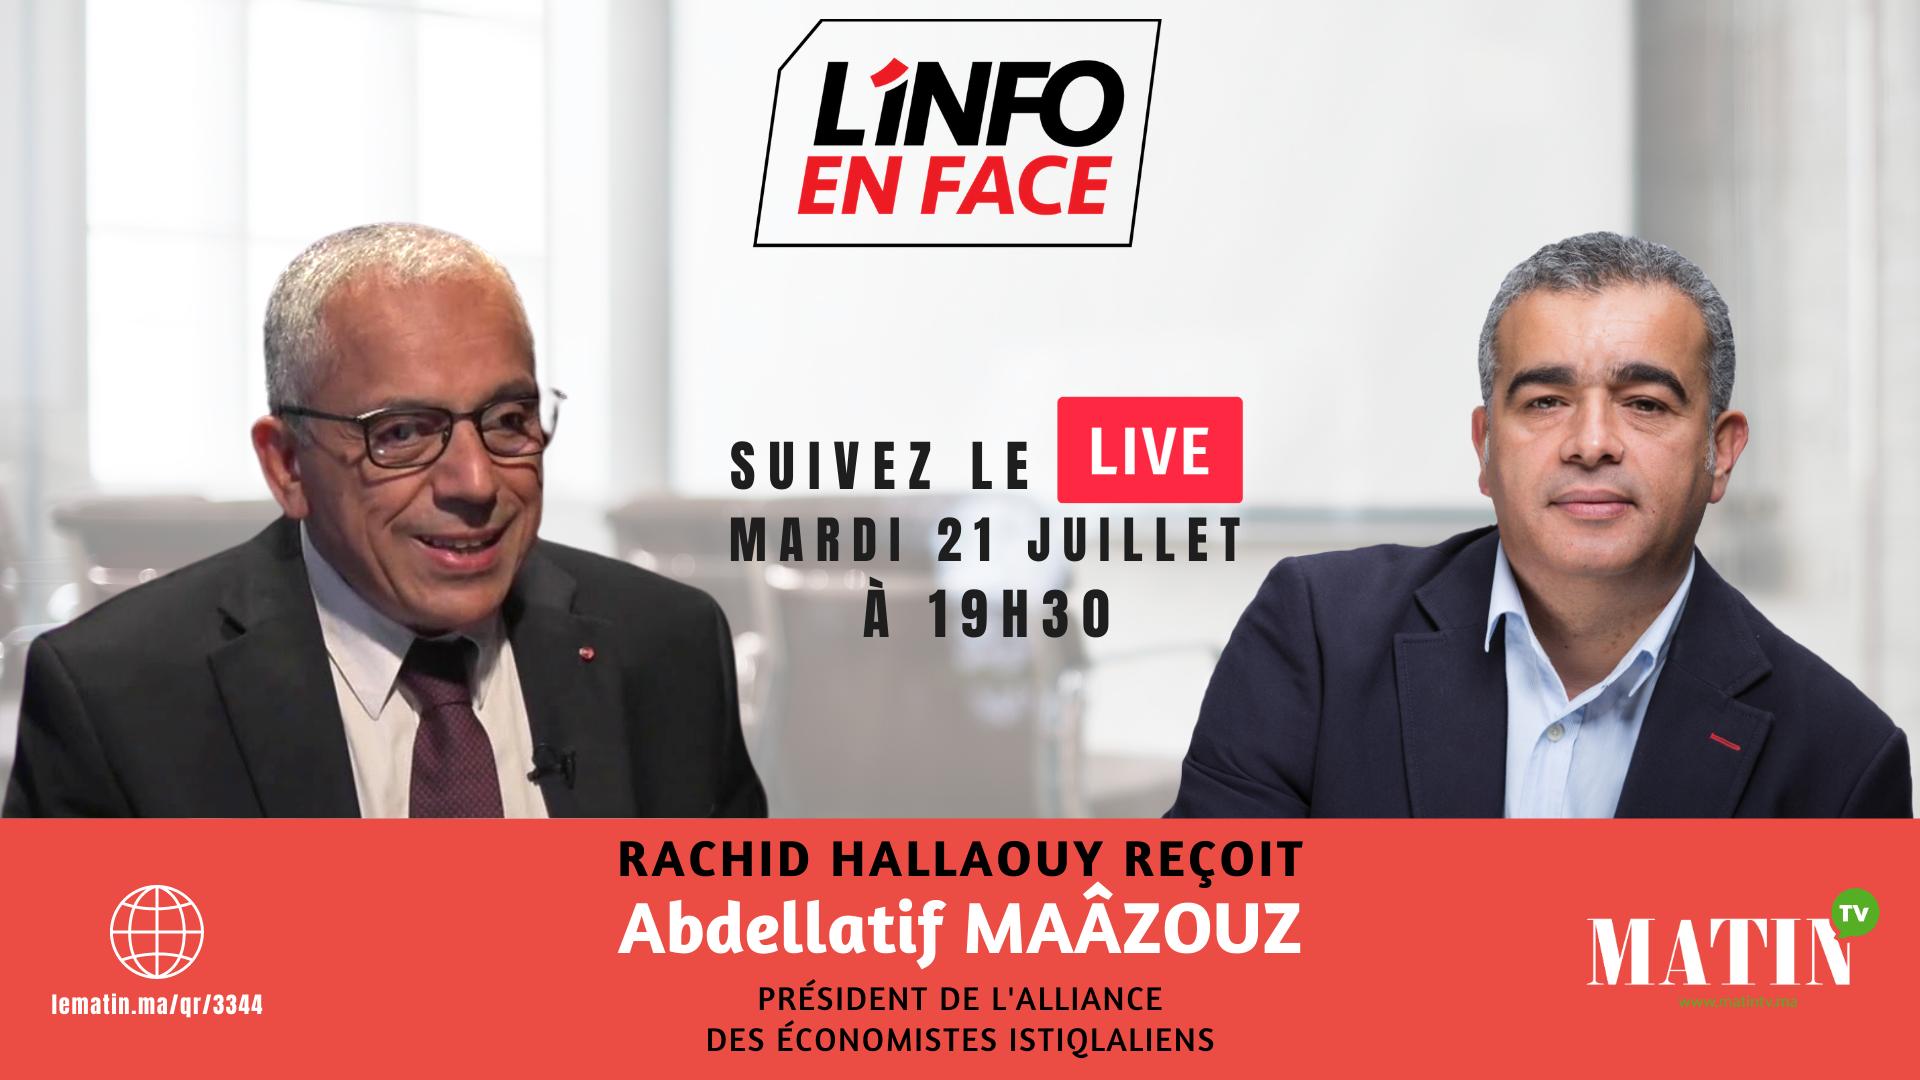 Live : L'Info en Face avec Abdellatif Maazouz